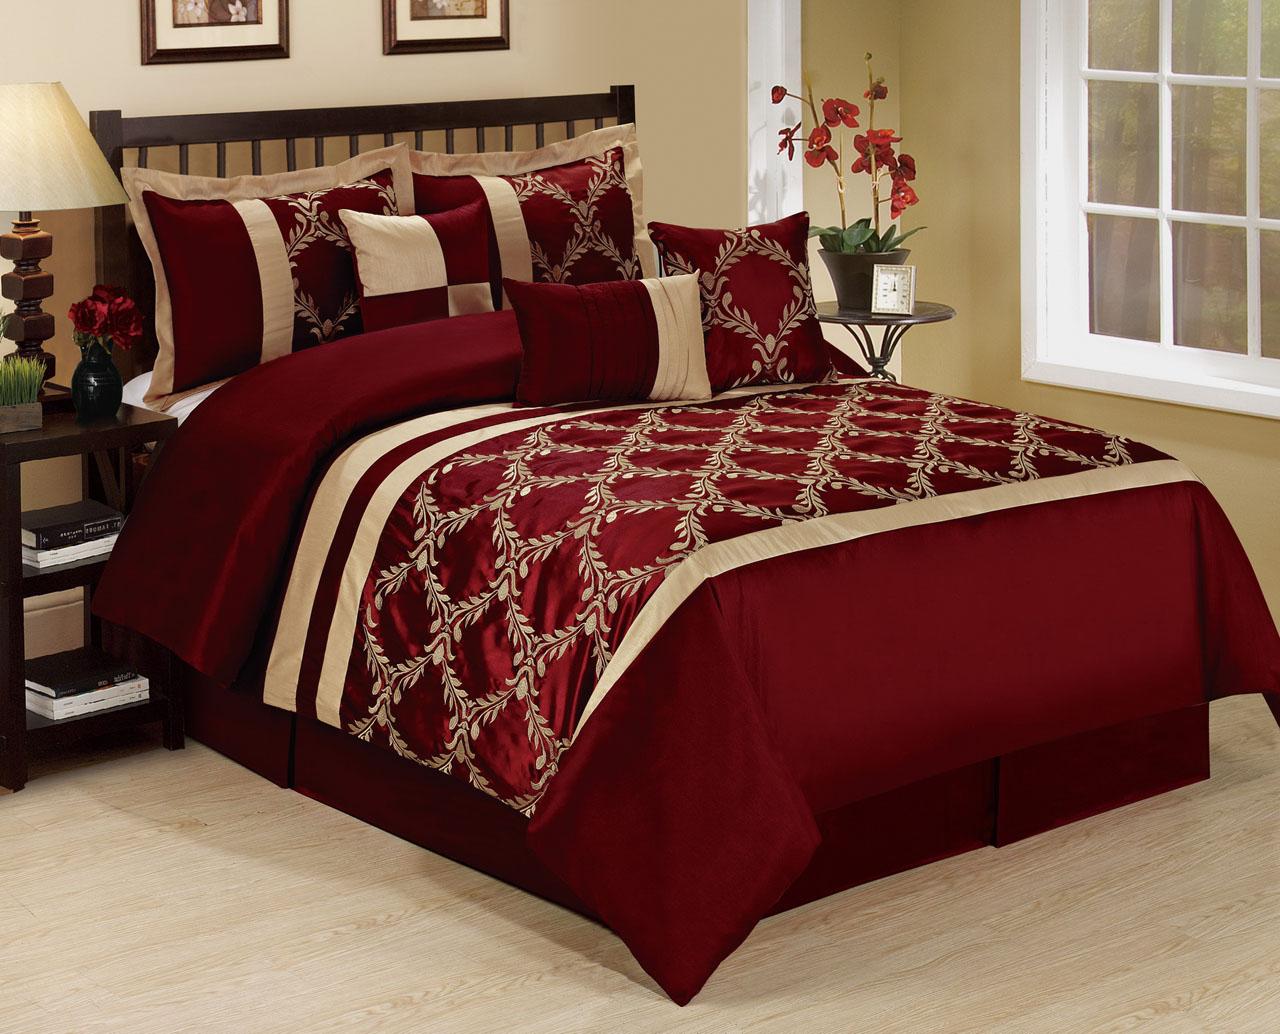 7 Piece Claremont Burgundy Taupe Comforter Set Ebay